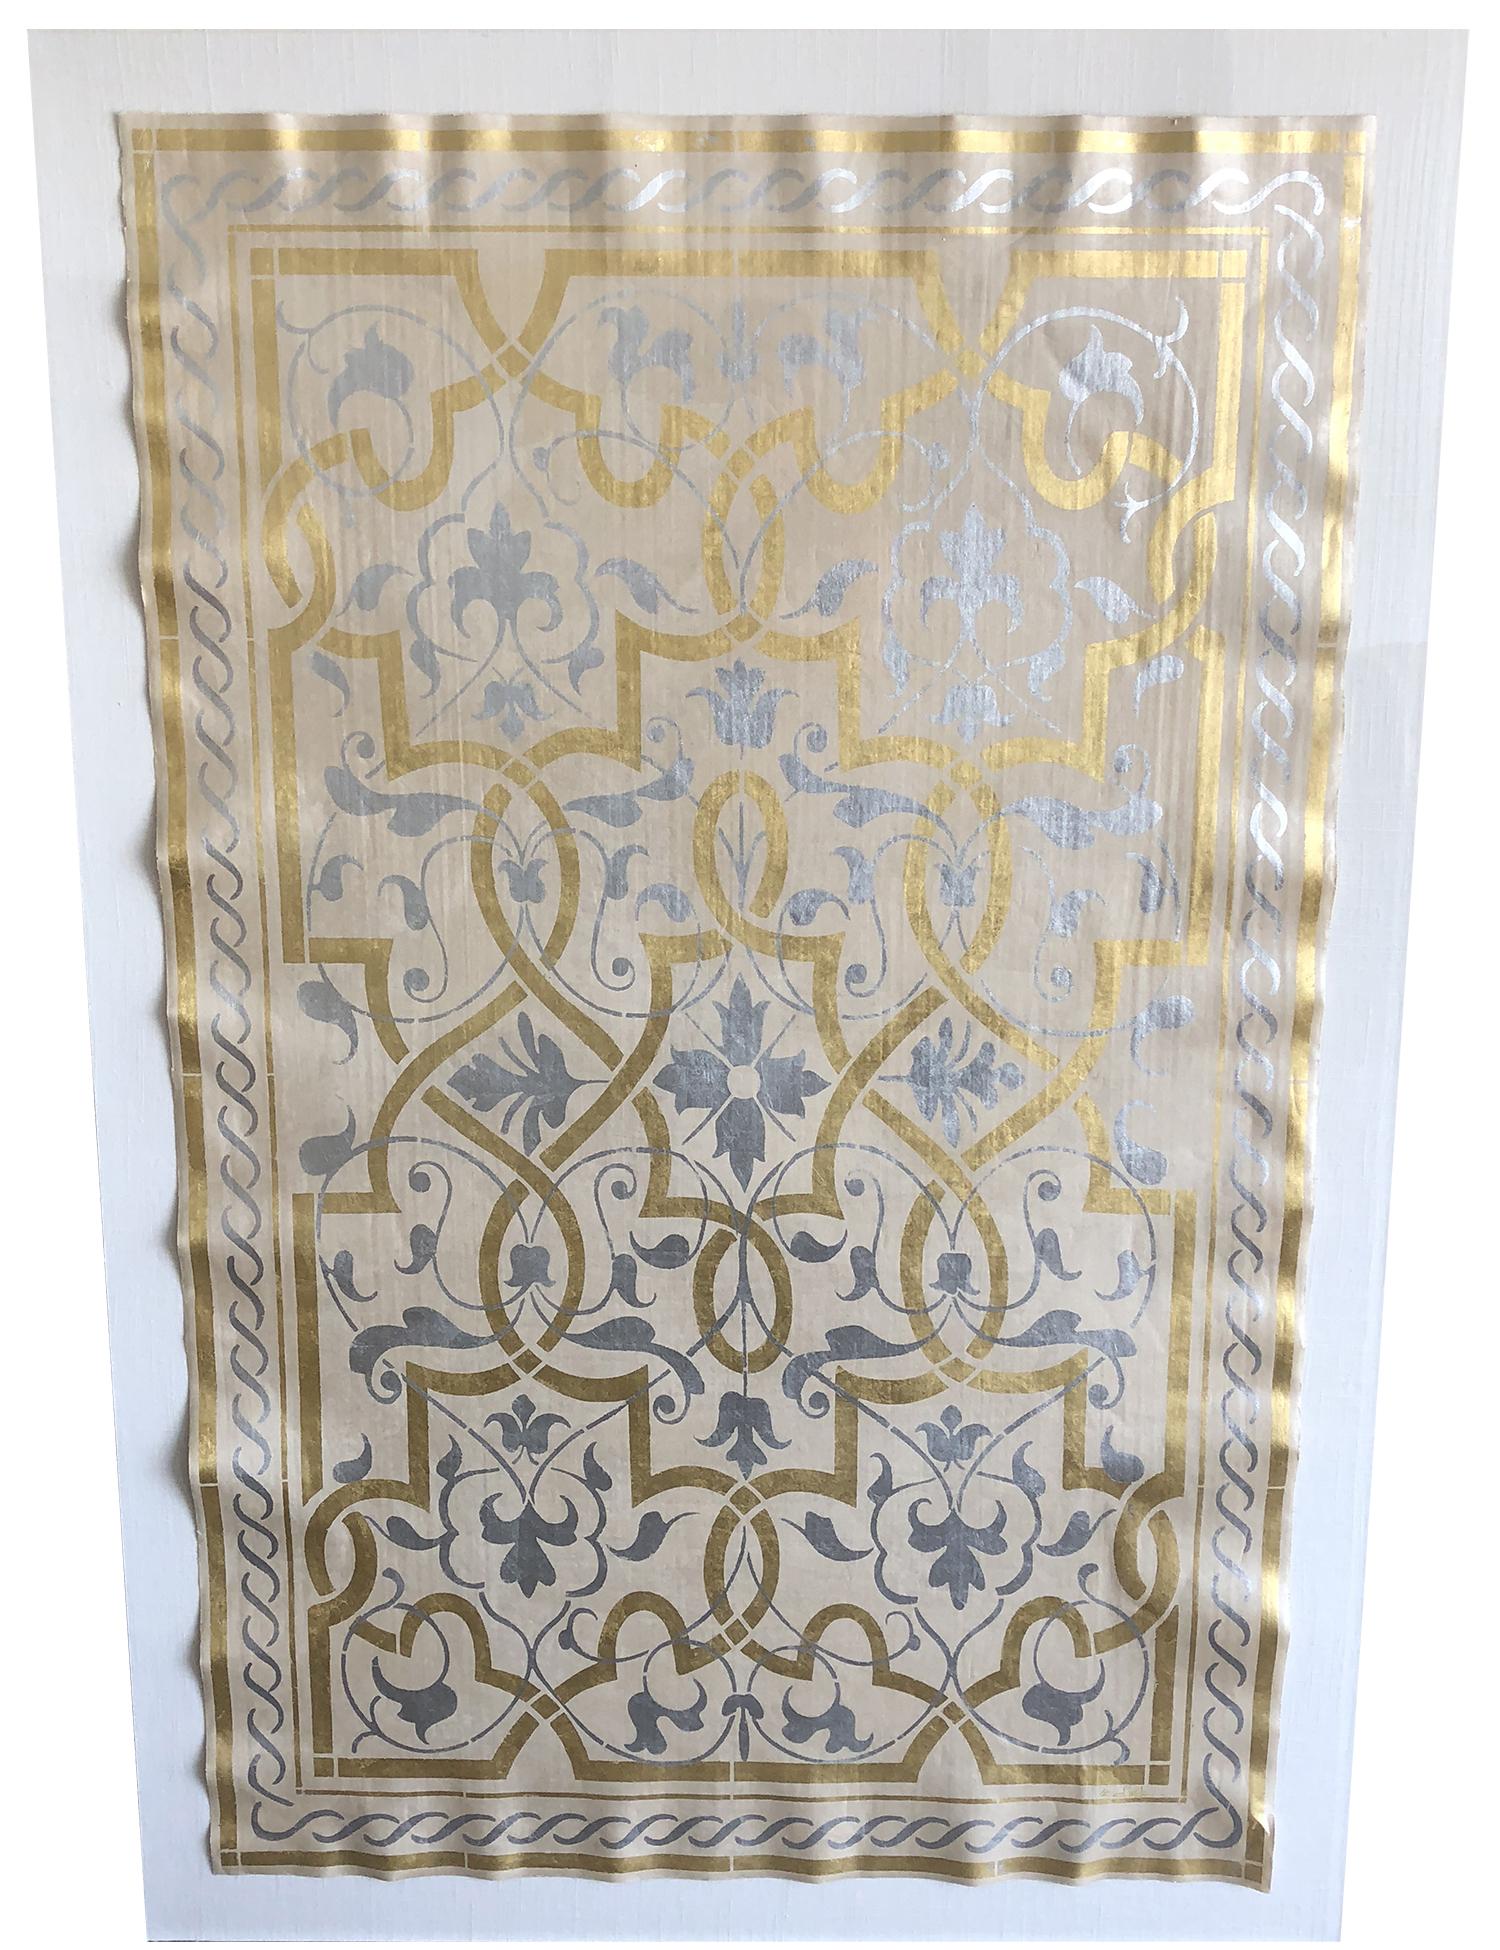 40 x 60 Italian Tapestry